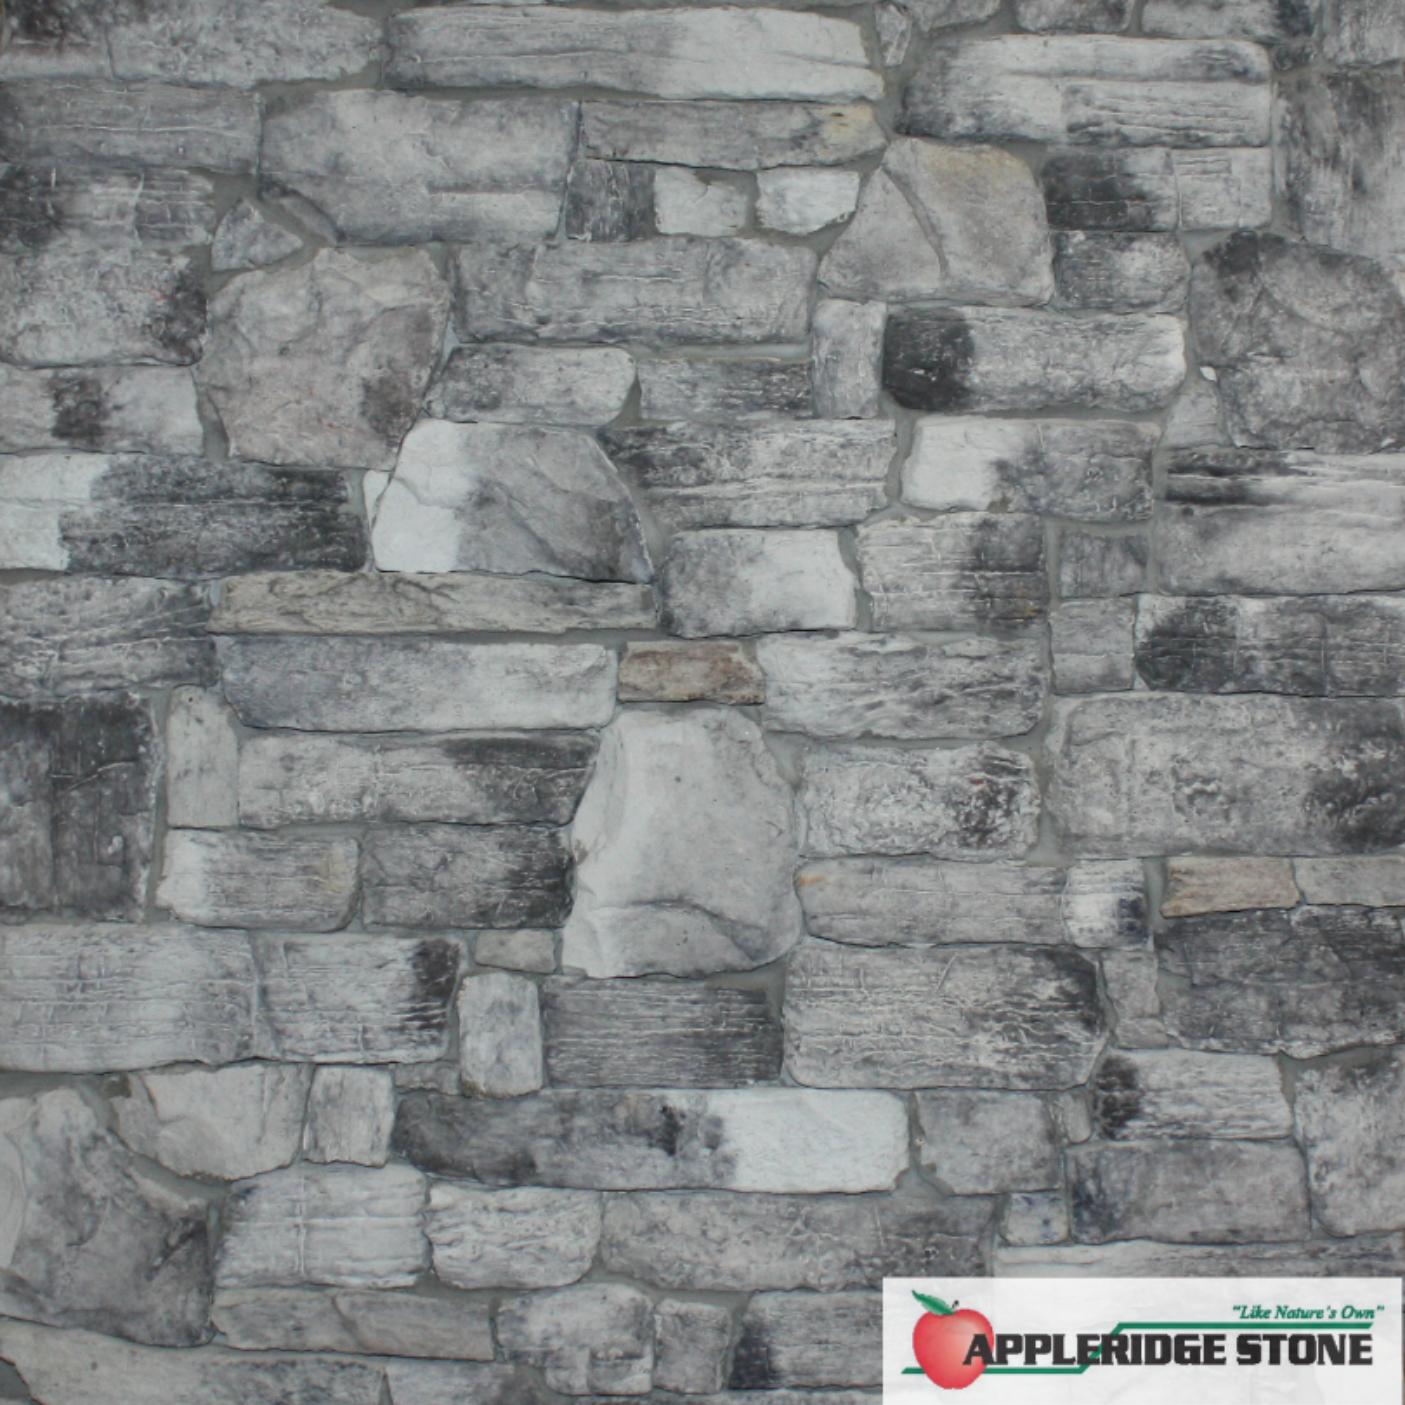 Appleridge Stone Stone Veneer Ridgestone Drystack Ridgestone Without A Mortar Joint Largest Stone 5 76 X 16 5 Smallest Stone Pattern Stone Mosaic Stone